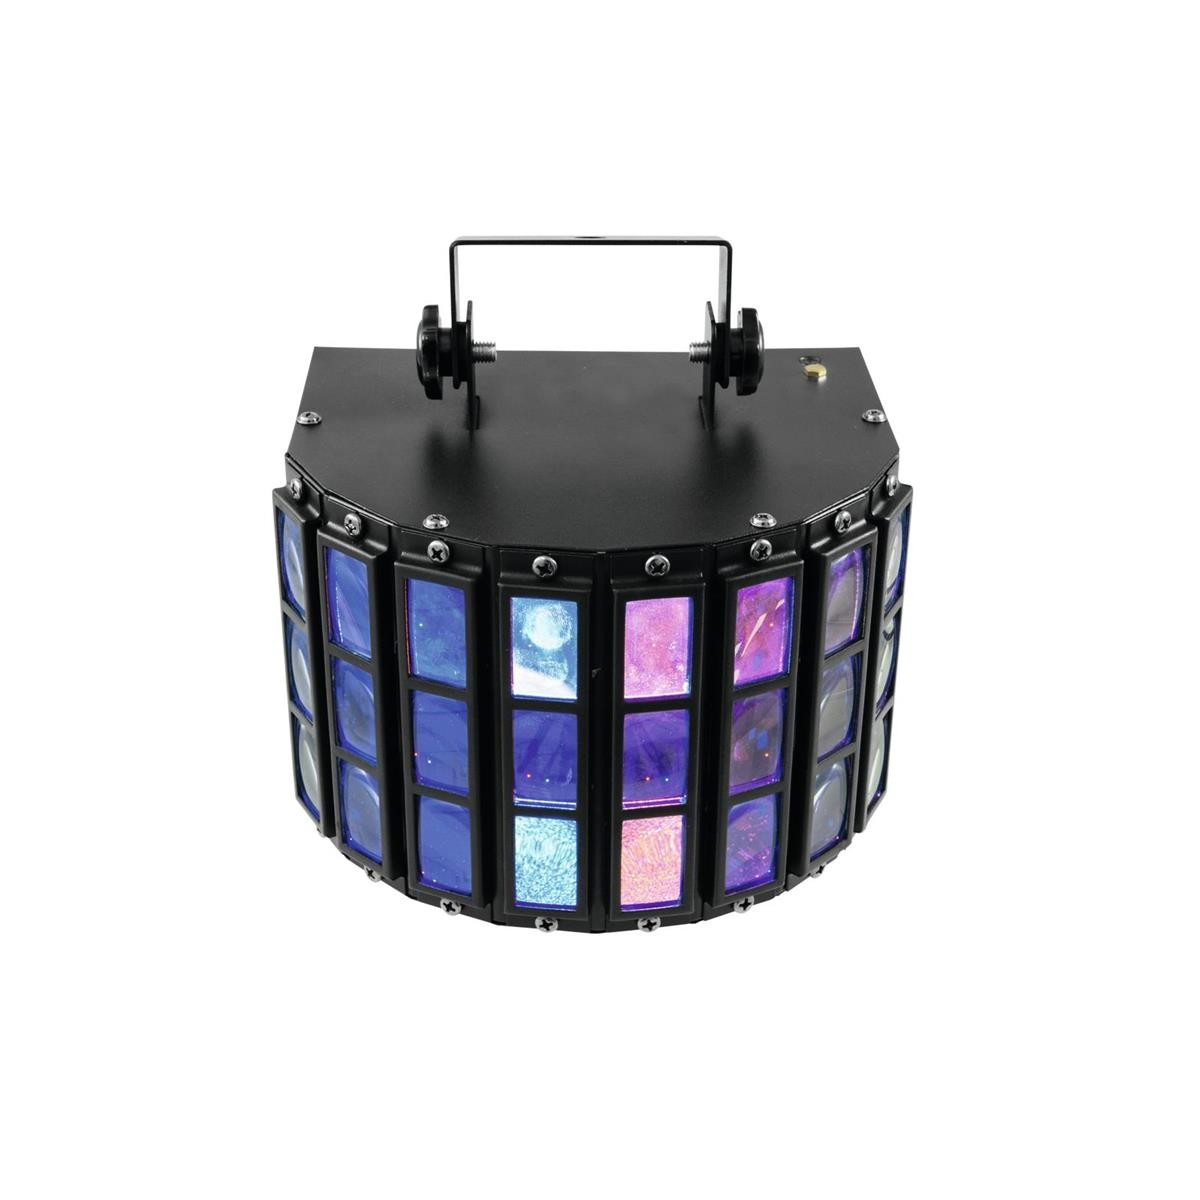 "LED Strahleneffekt - kompakt und ""party-ready"" - 5 Farben, musikgesteuerte Beamshow ""MINI-D5"""